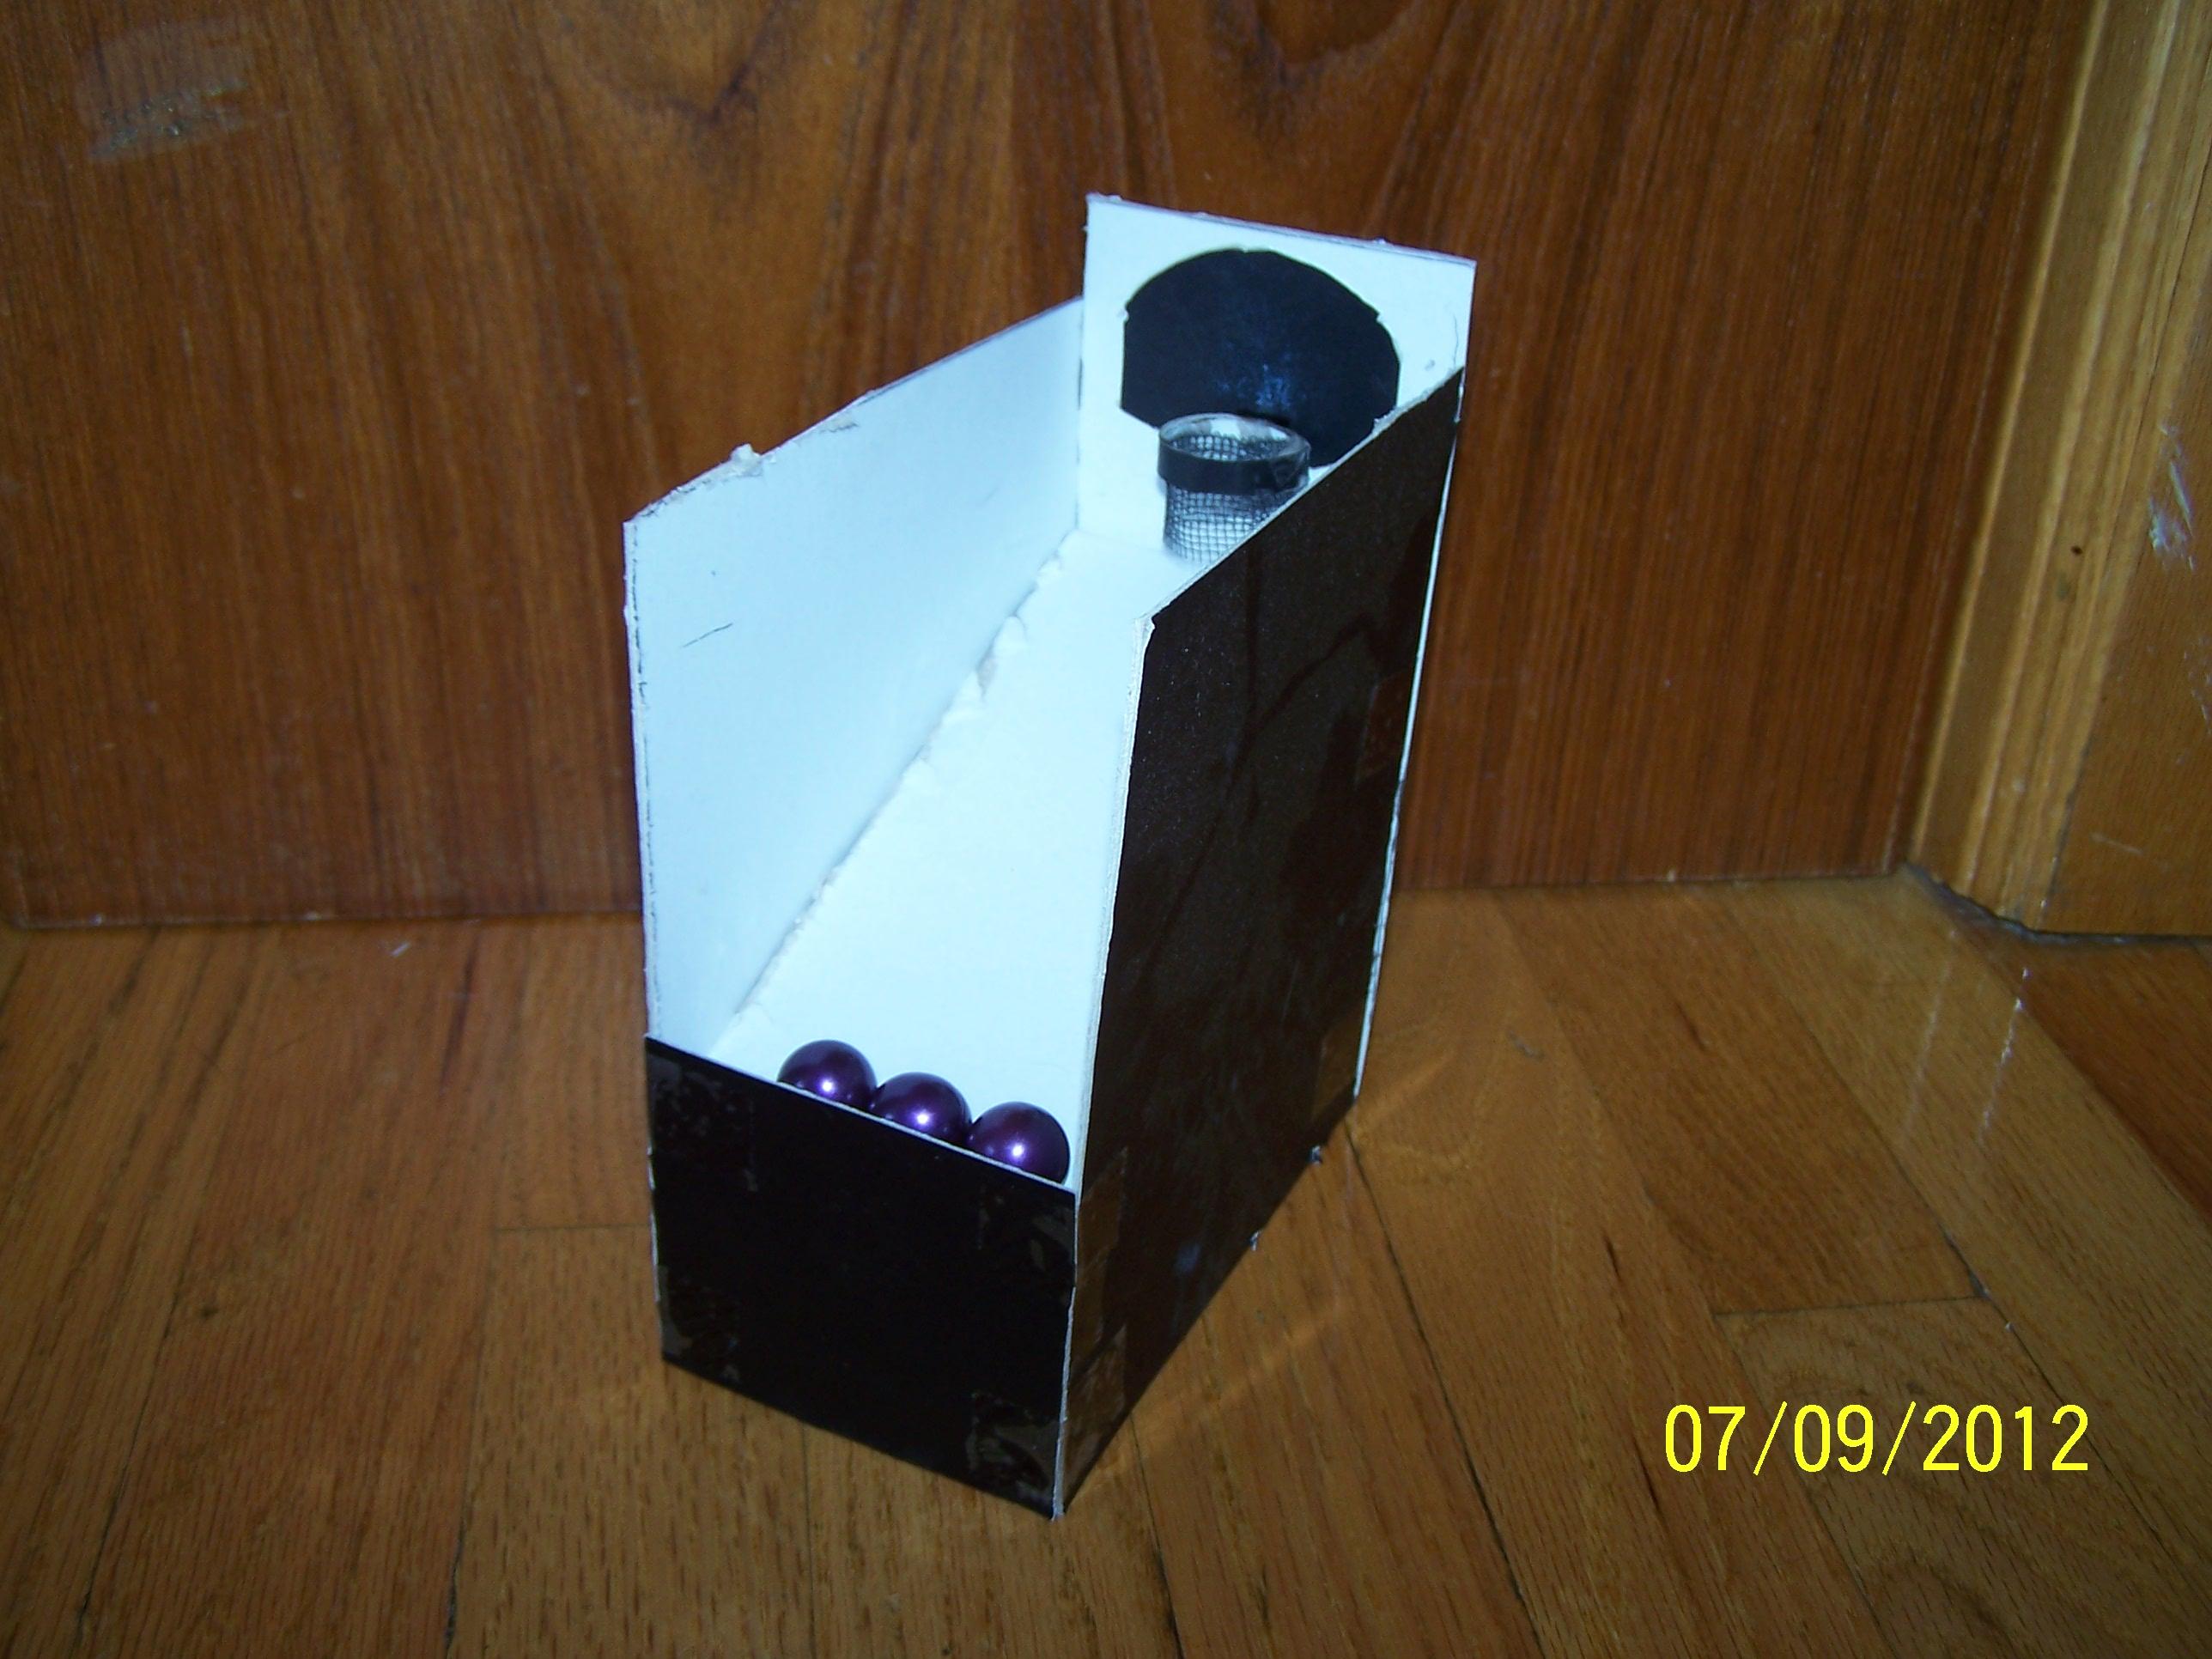 Cardboard Mini Arcade Basketball